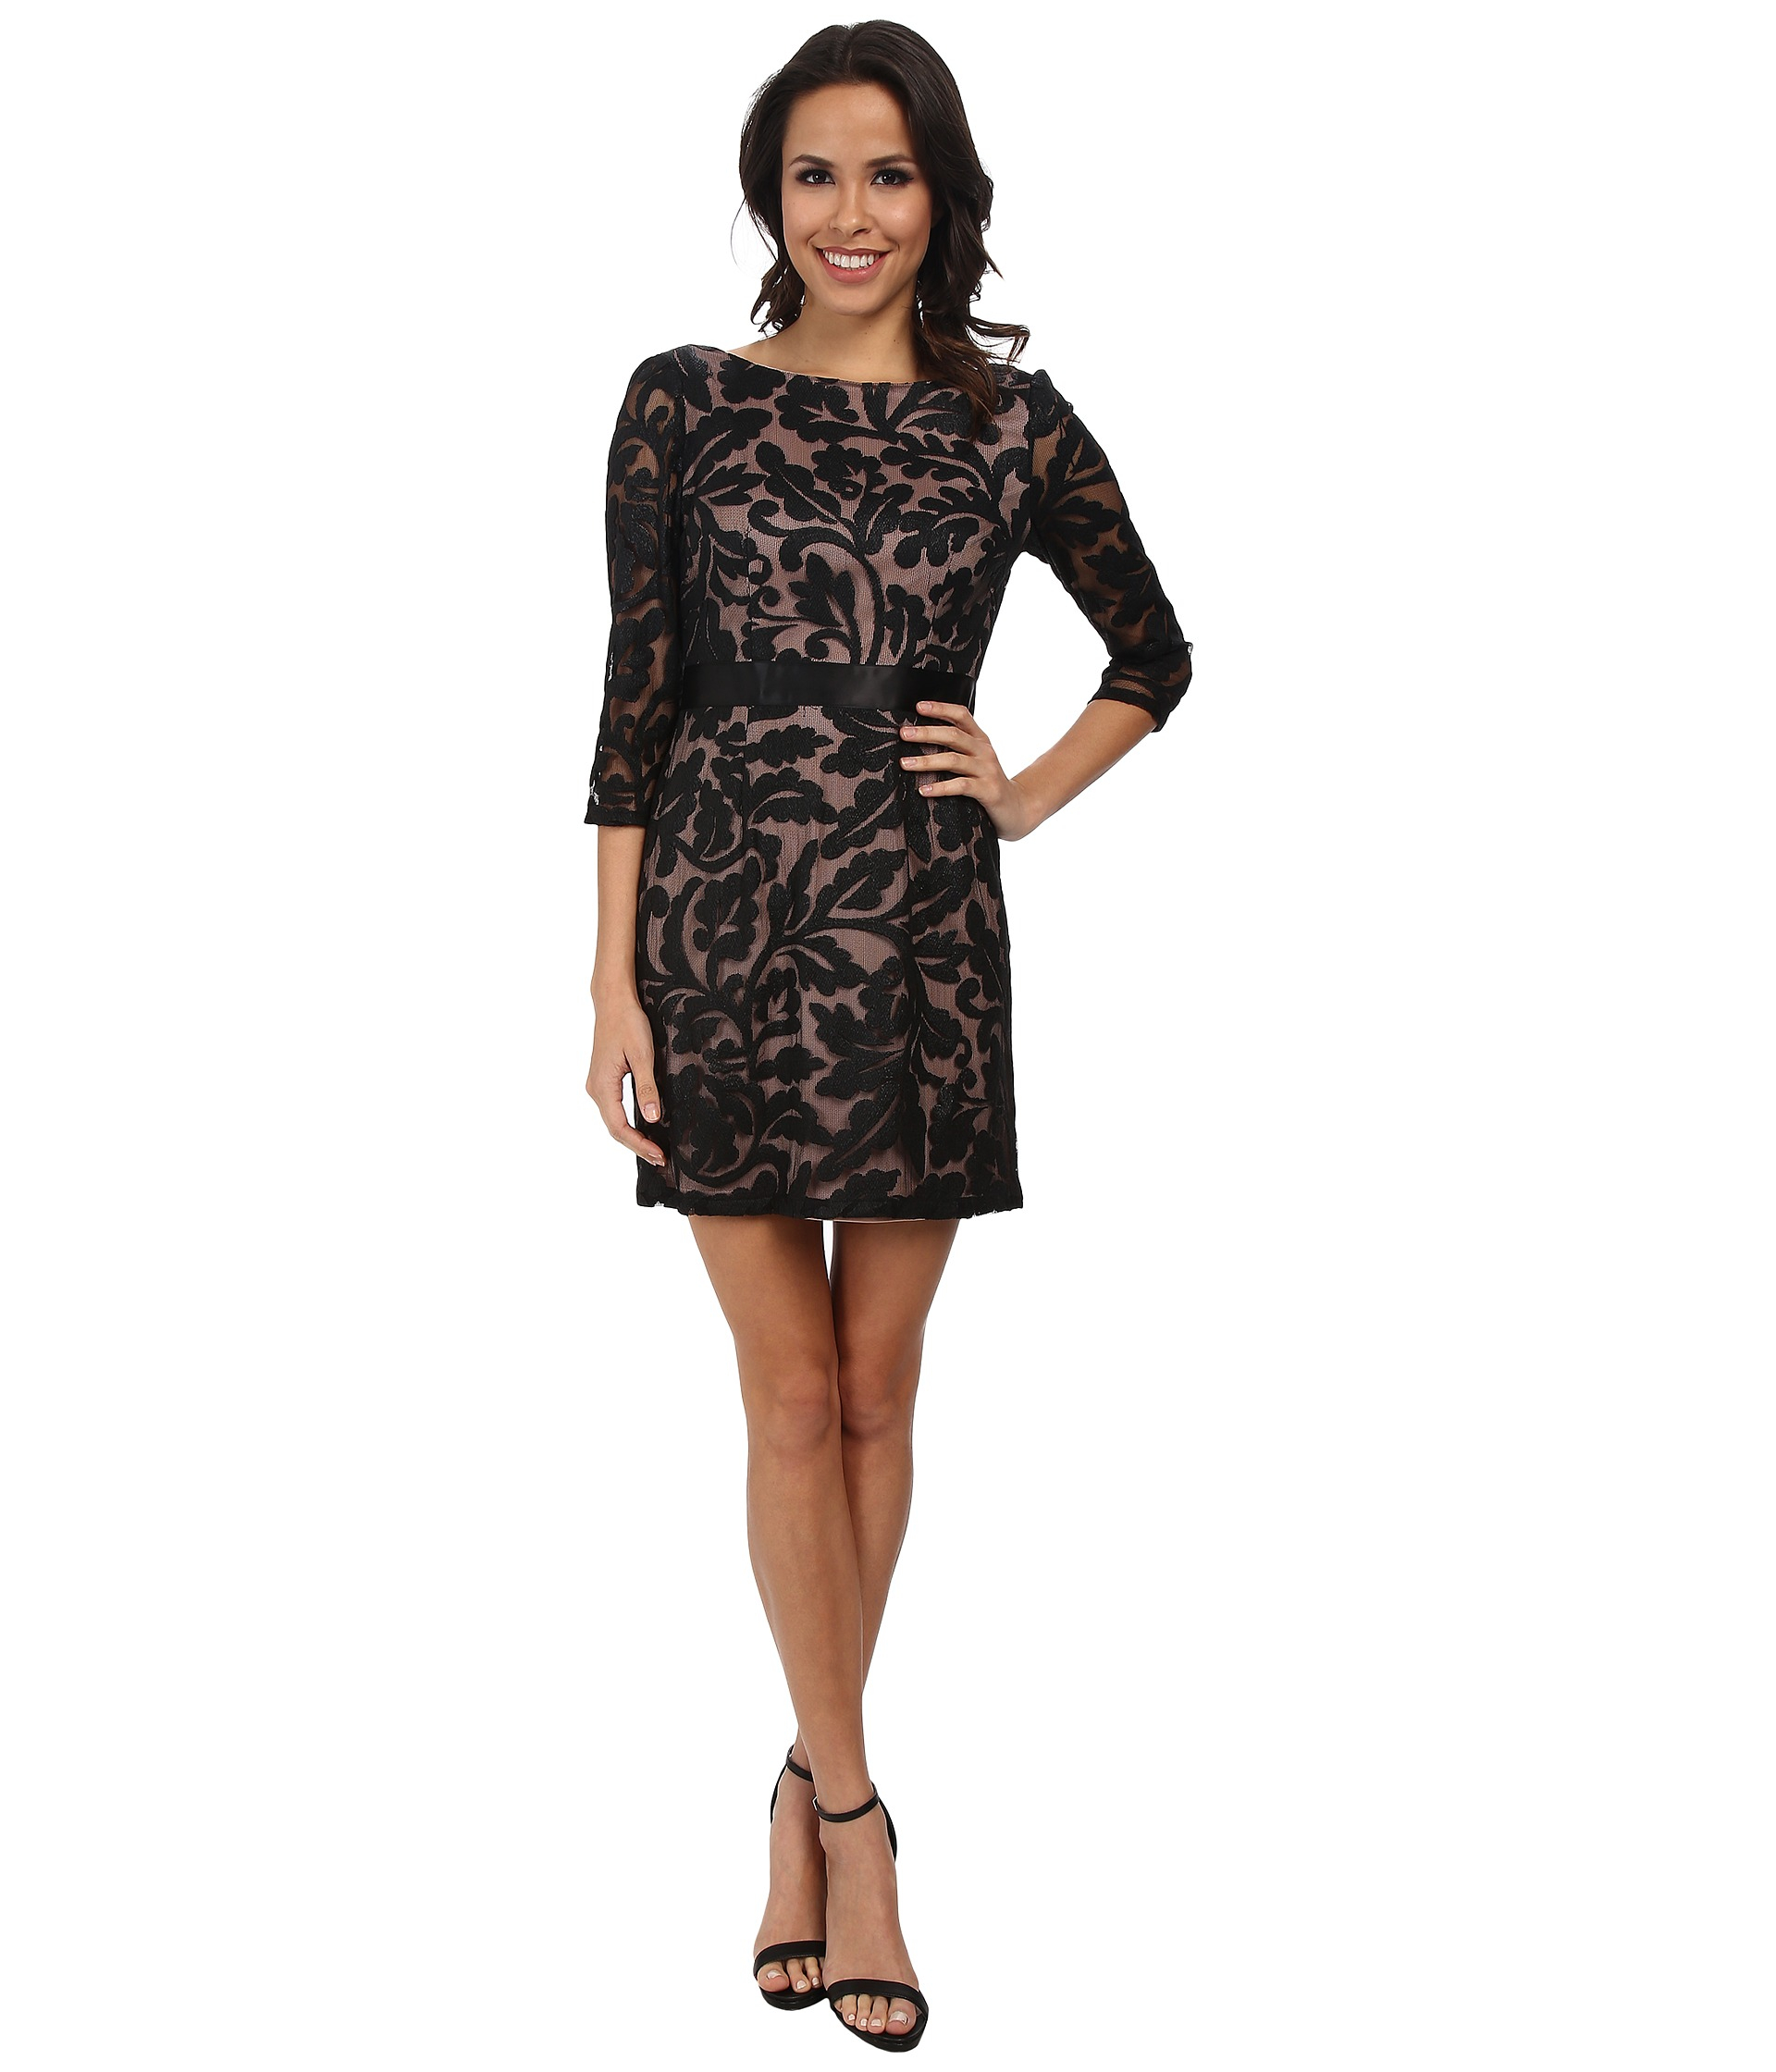 3/4 Sleeve Black Cocktail Dresses